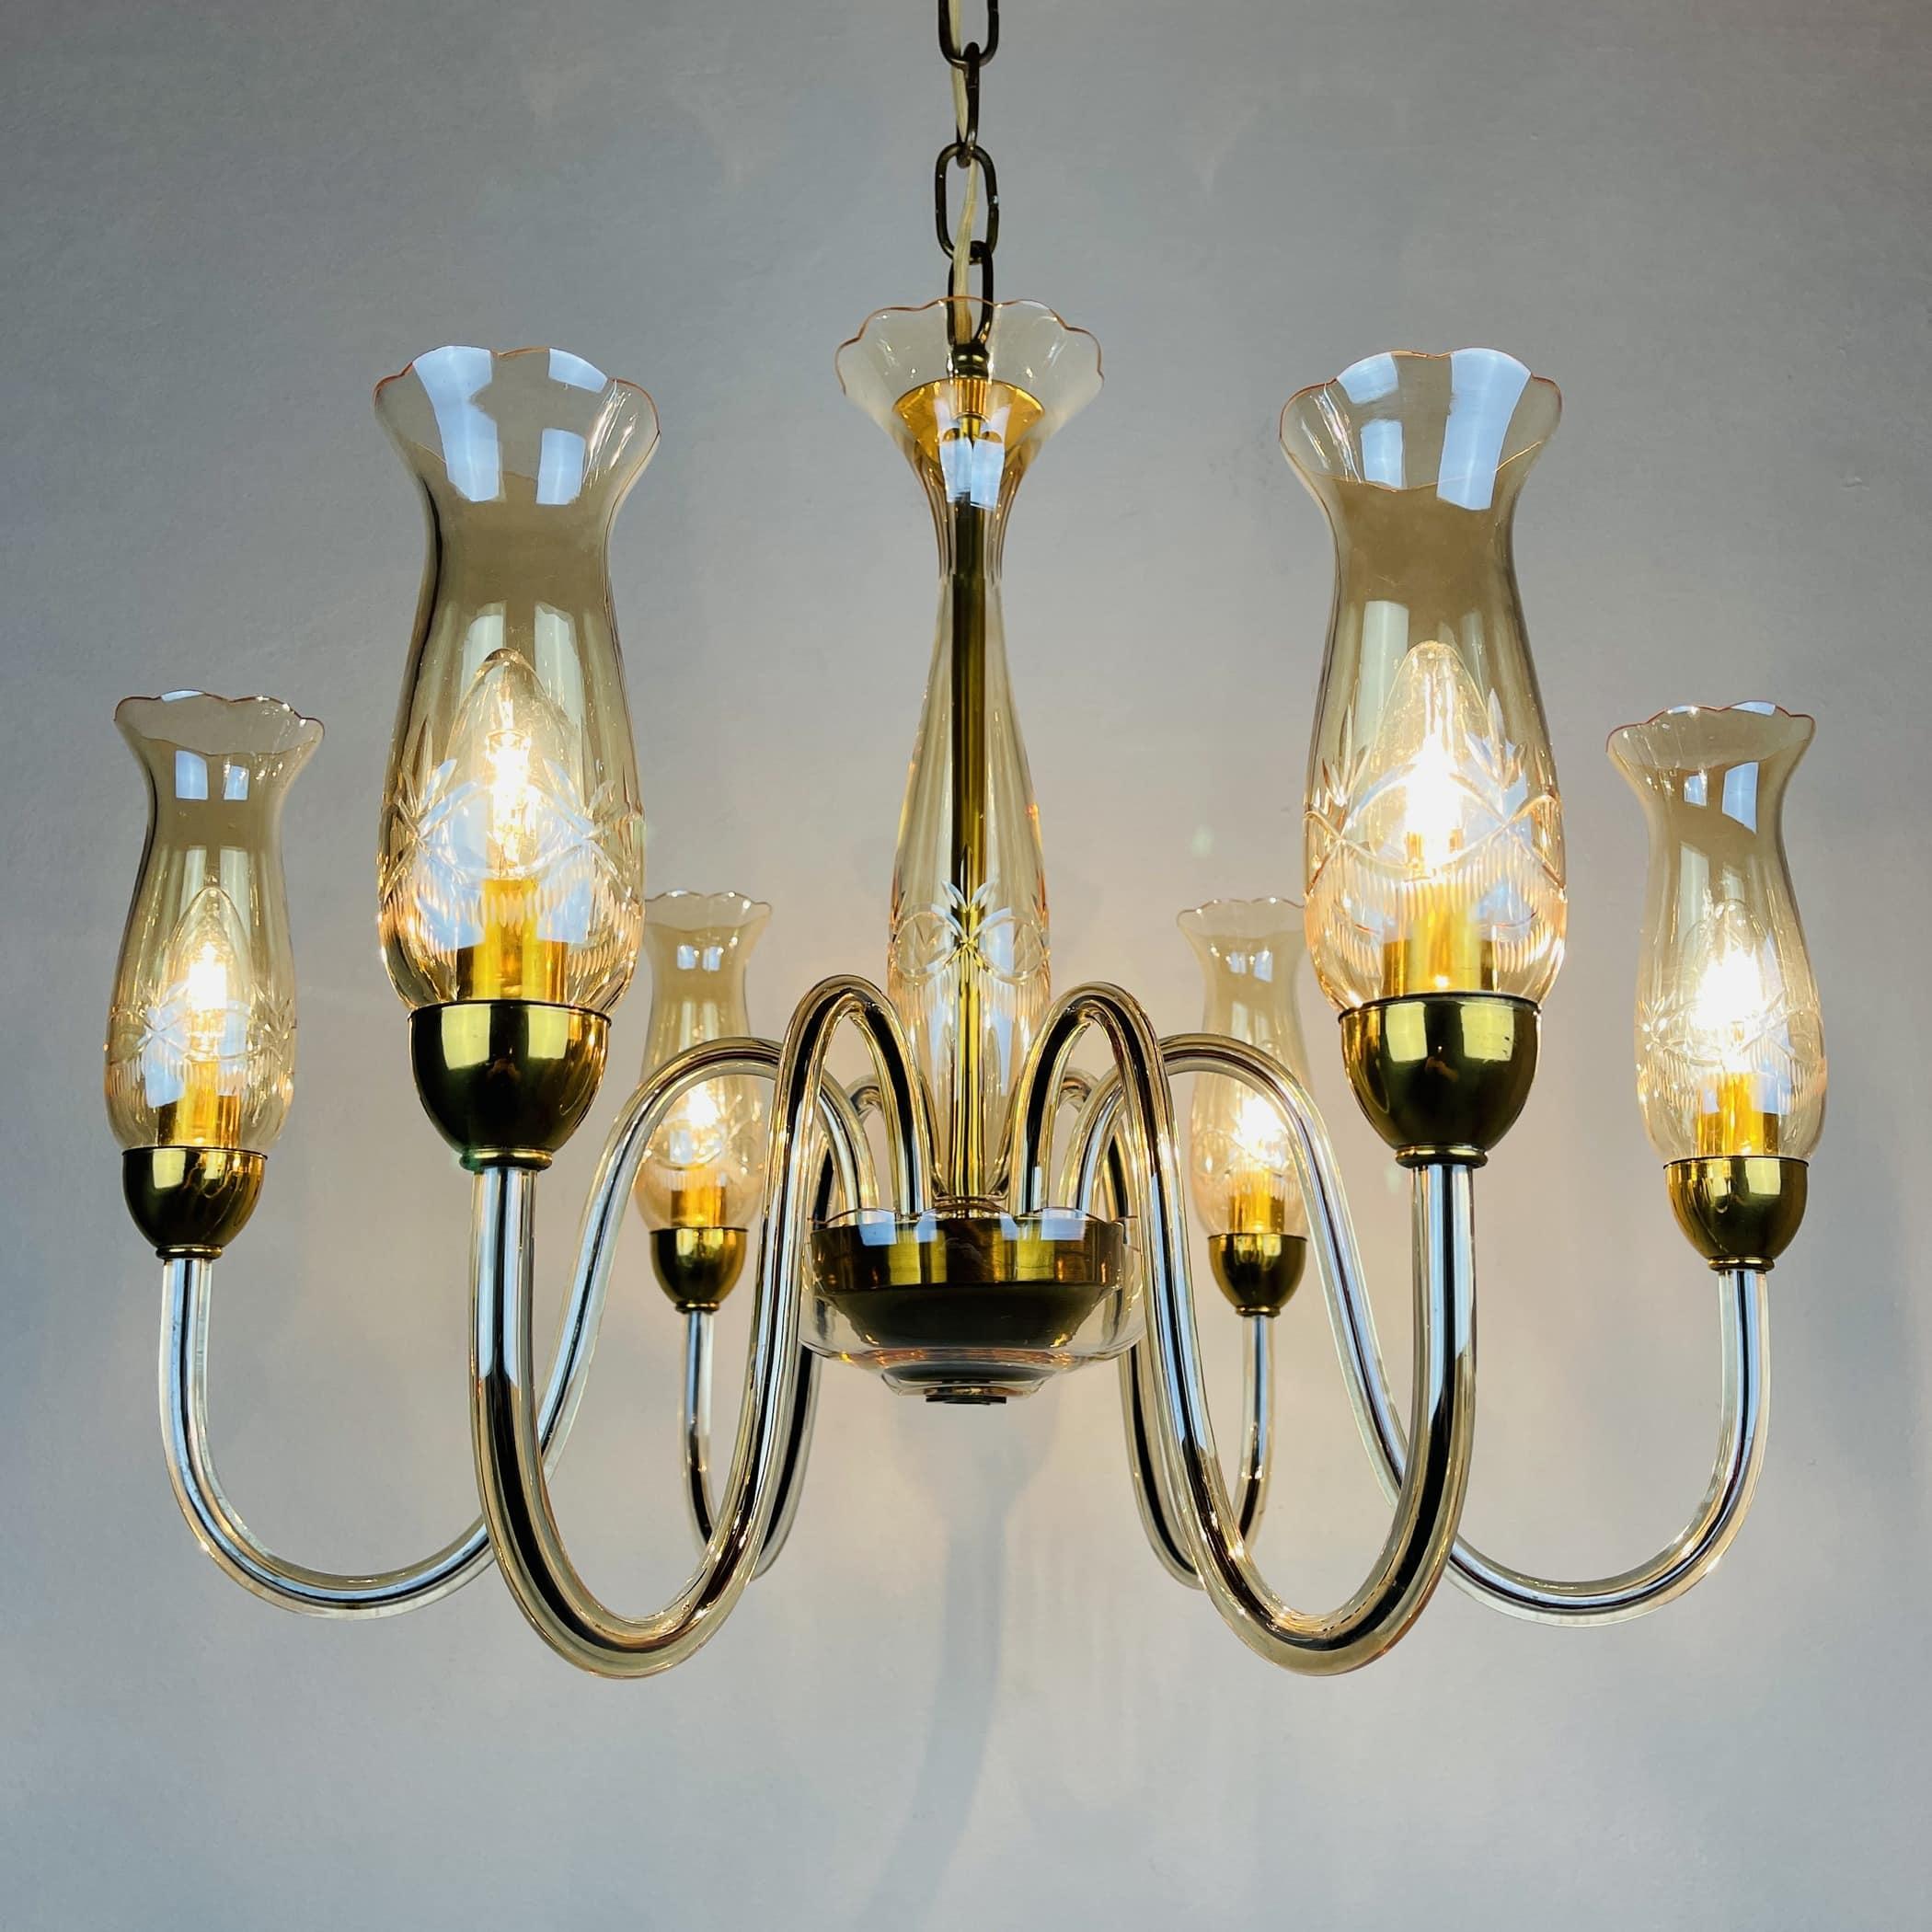 Vintage amber murano chandelier De Majo Italy 1970s Mid-century italian chandelier 6 bulbs